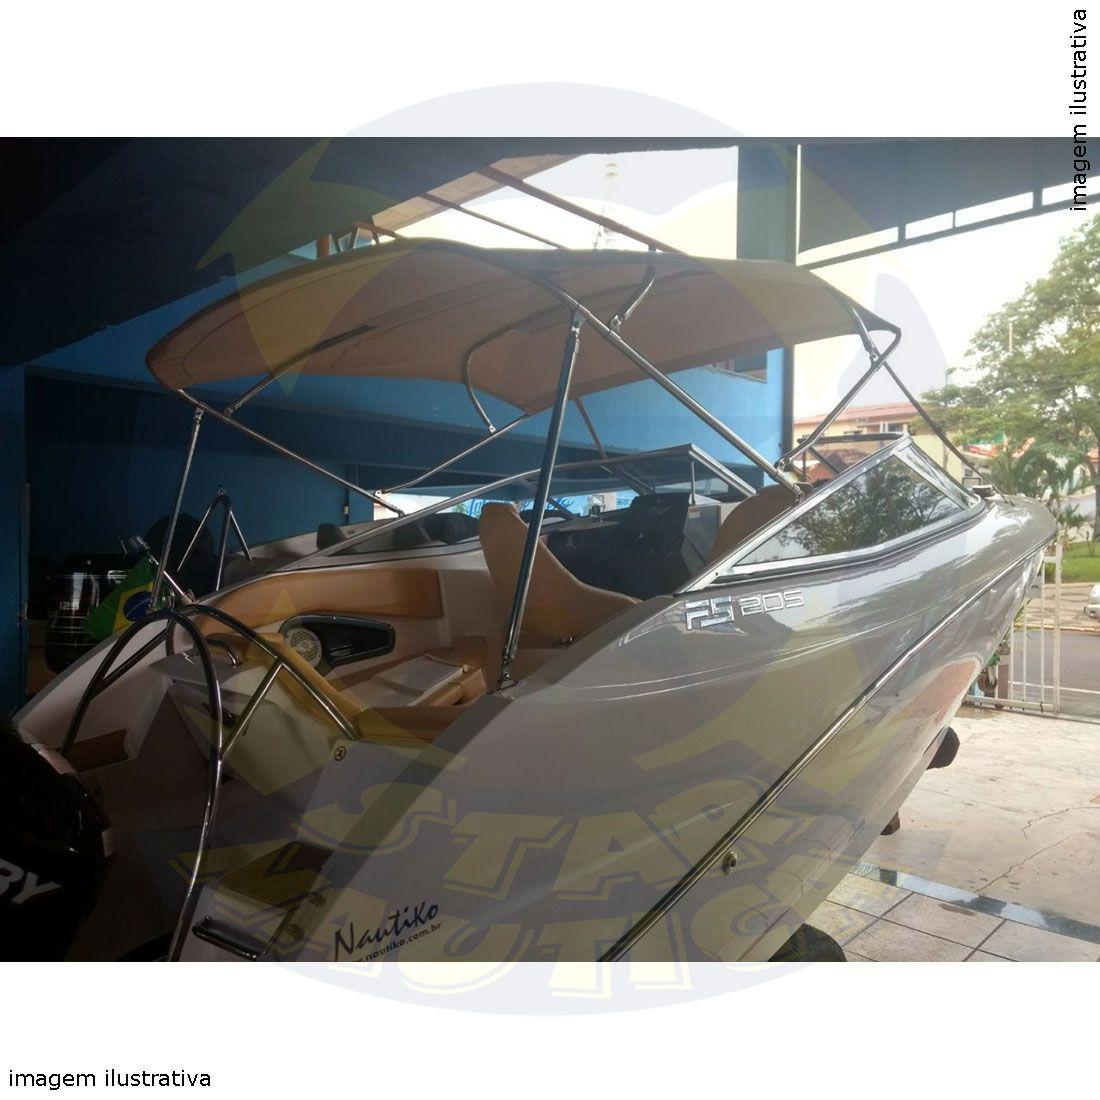 Capota Toldo Lancha Focker 240 Poliéster 4 Arcos Tubo 1 1/4